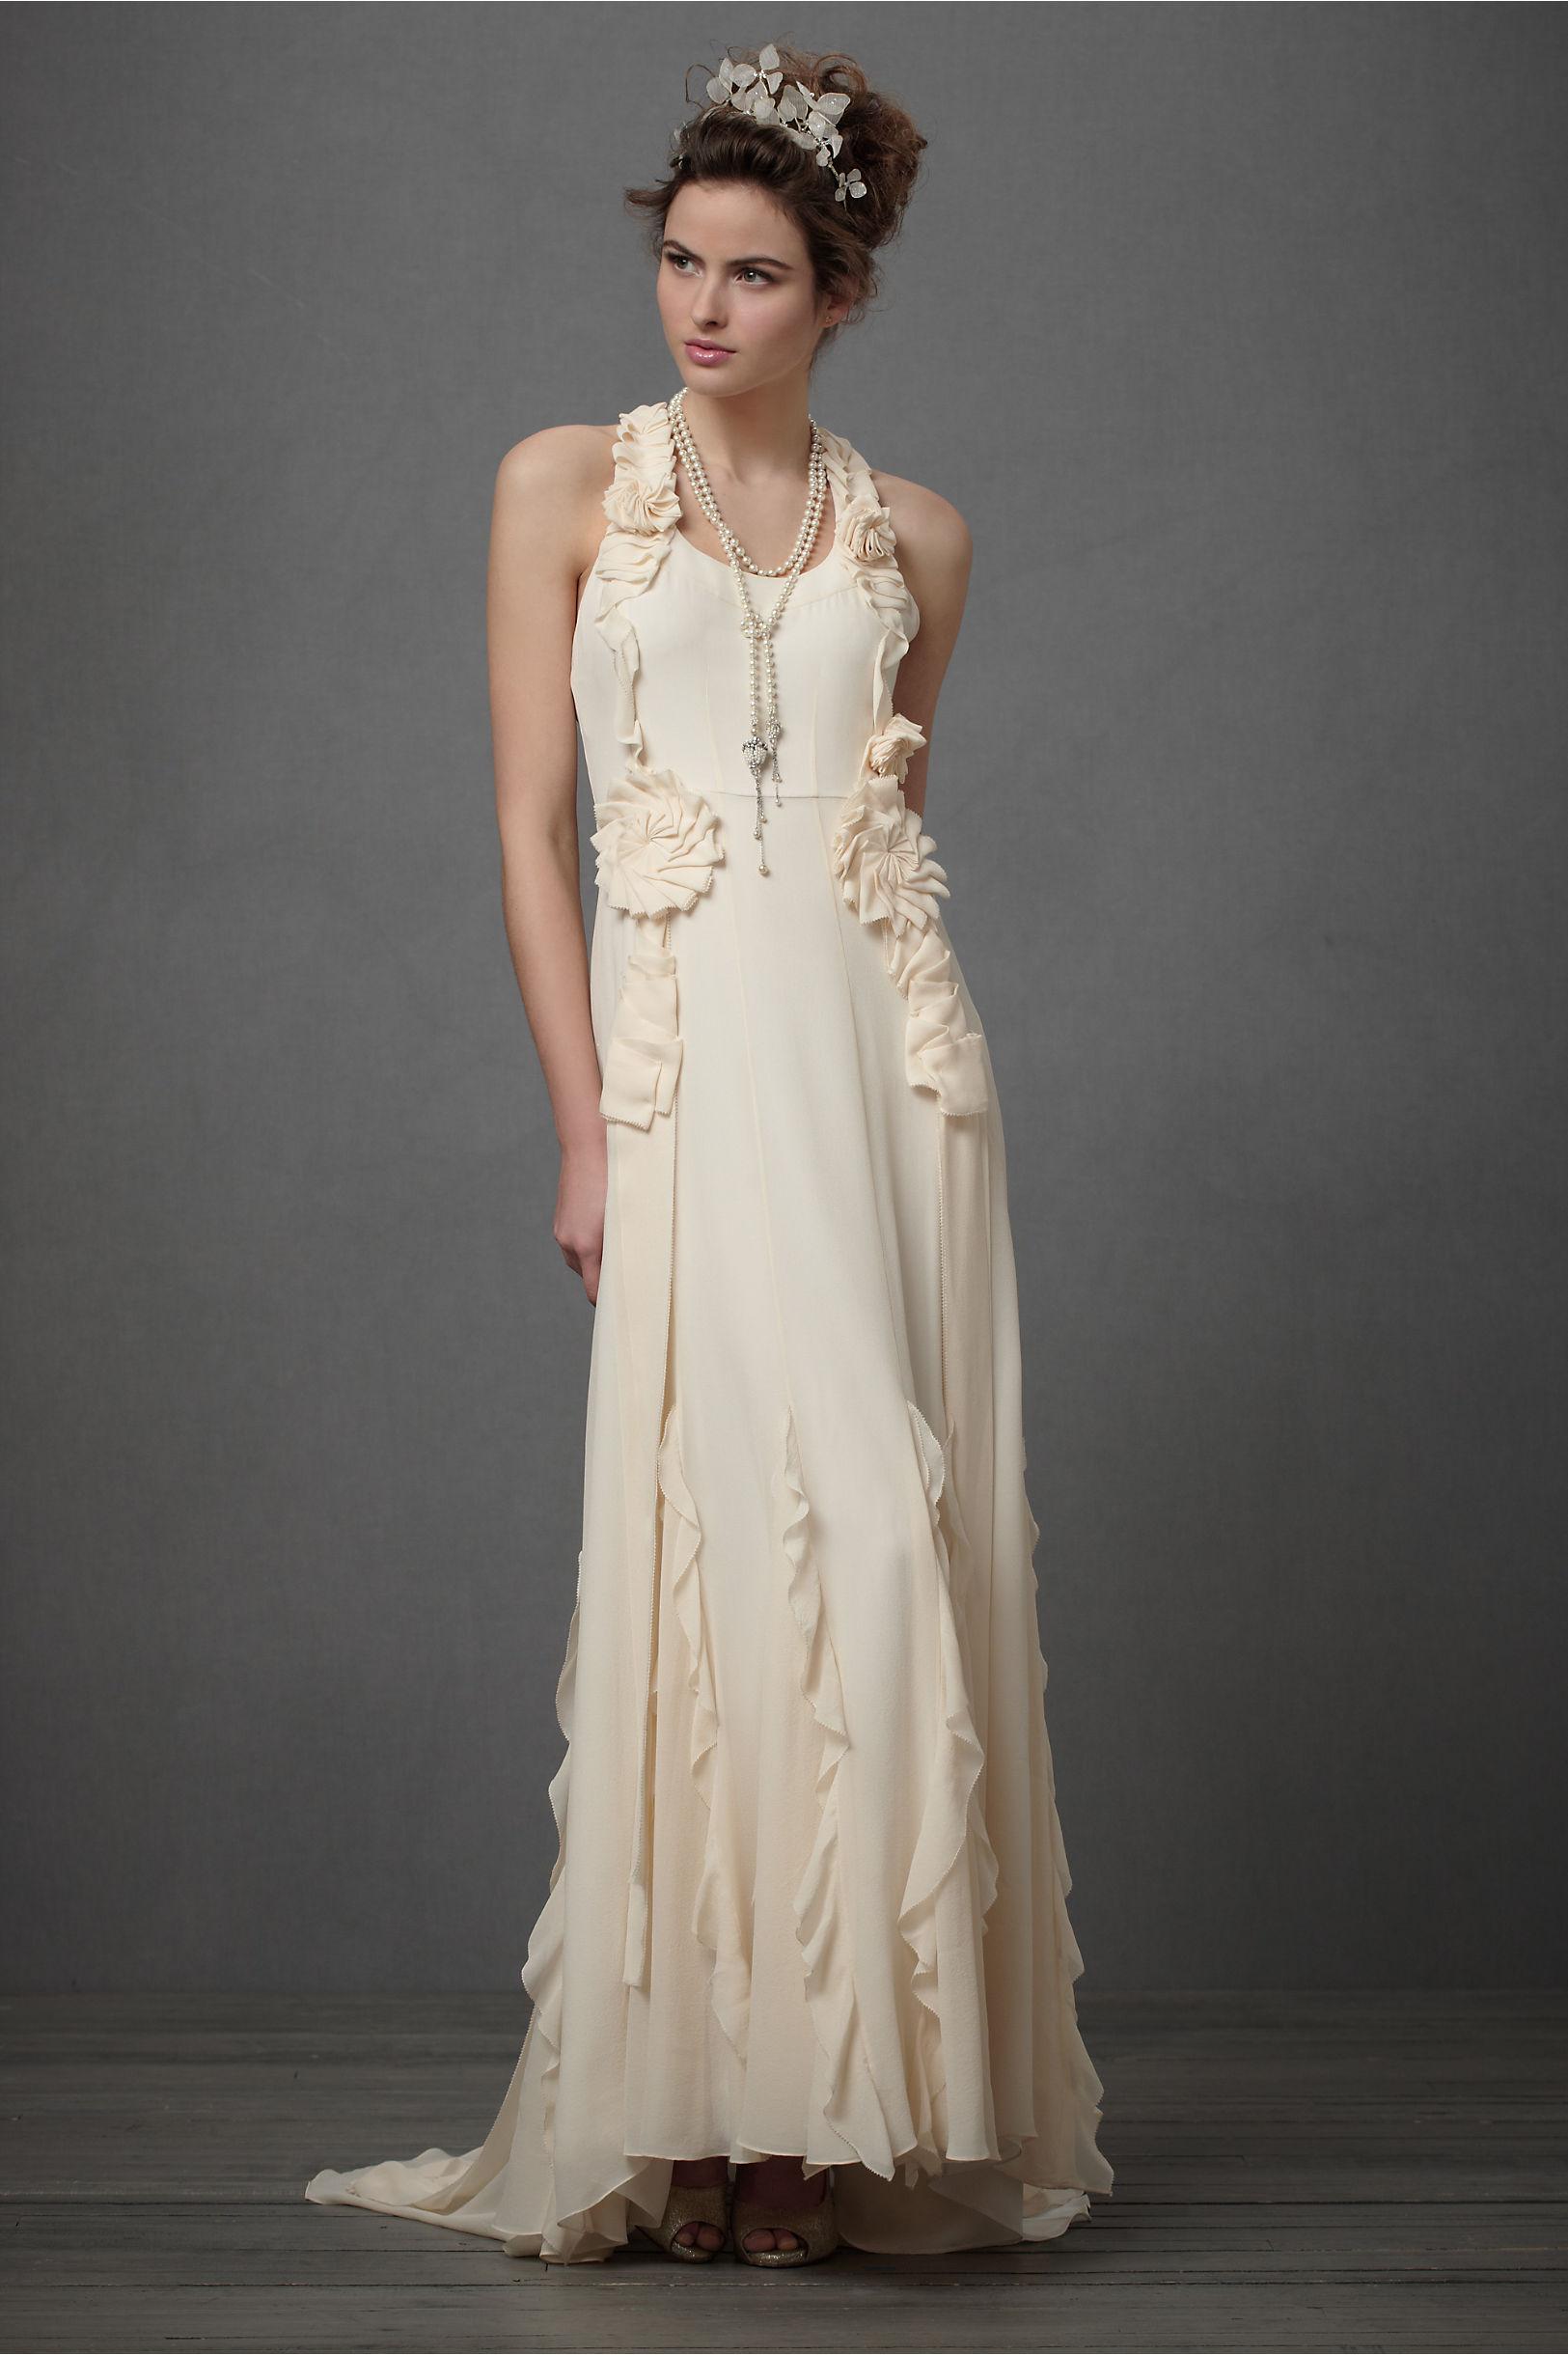 Avante-Garde Gown in Bride | BHLDN